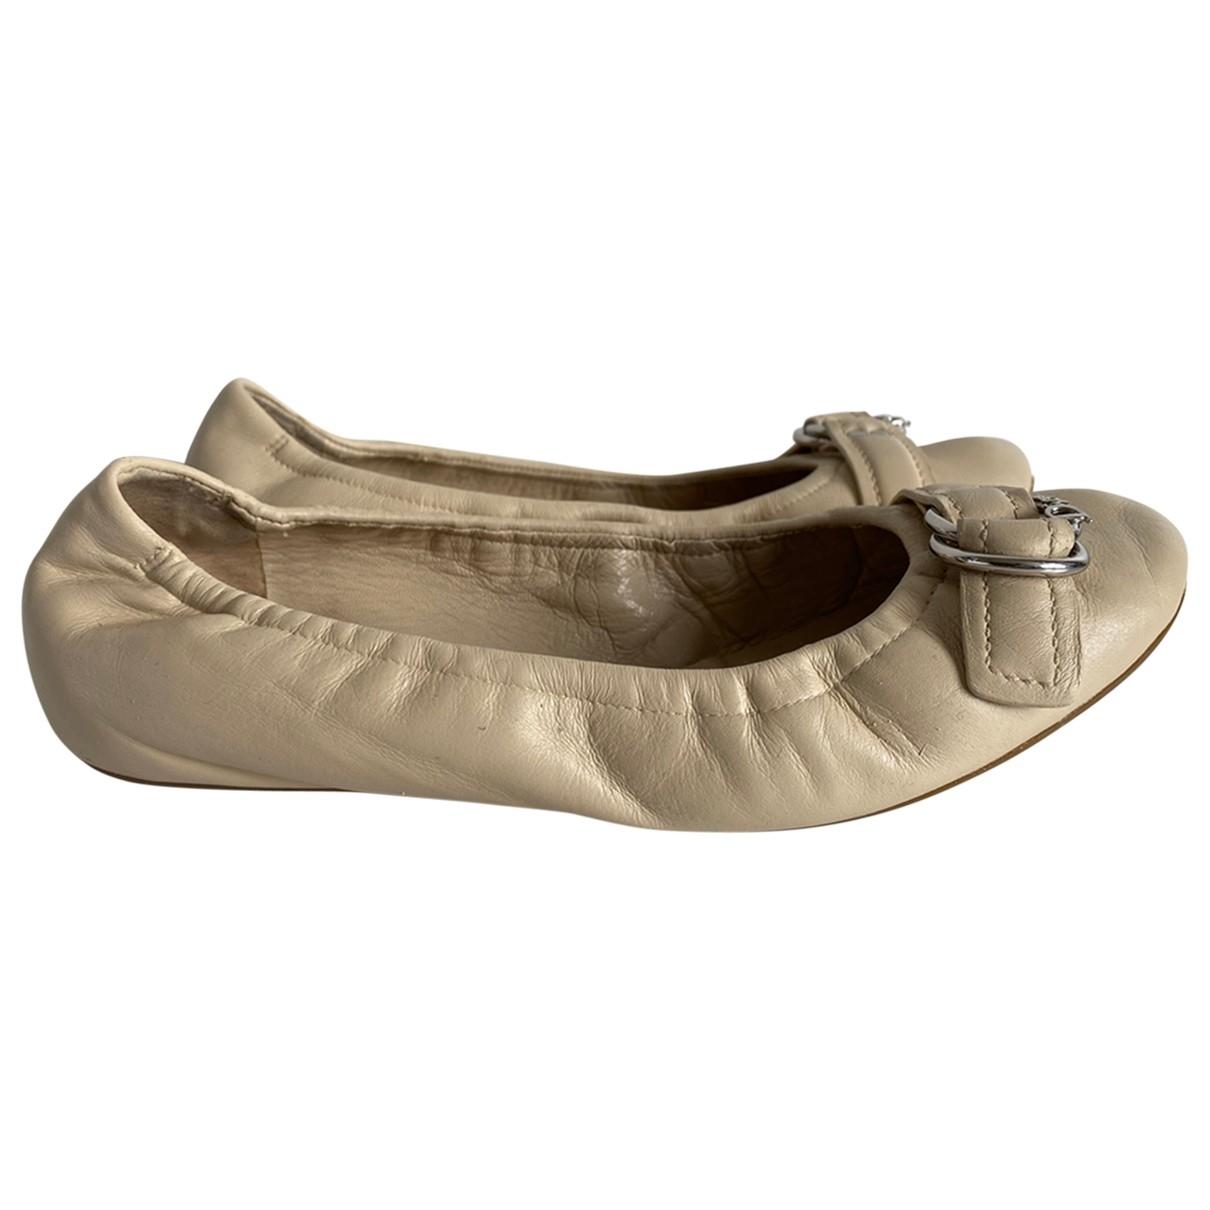 Dior - Ballerines   pour femme en cuir - beige